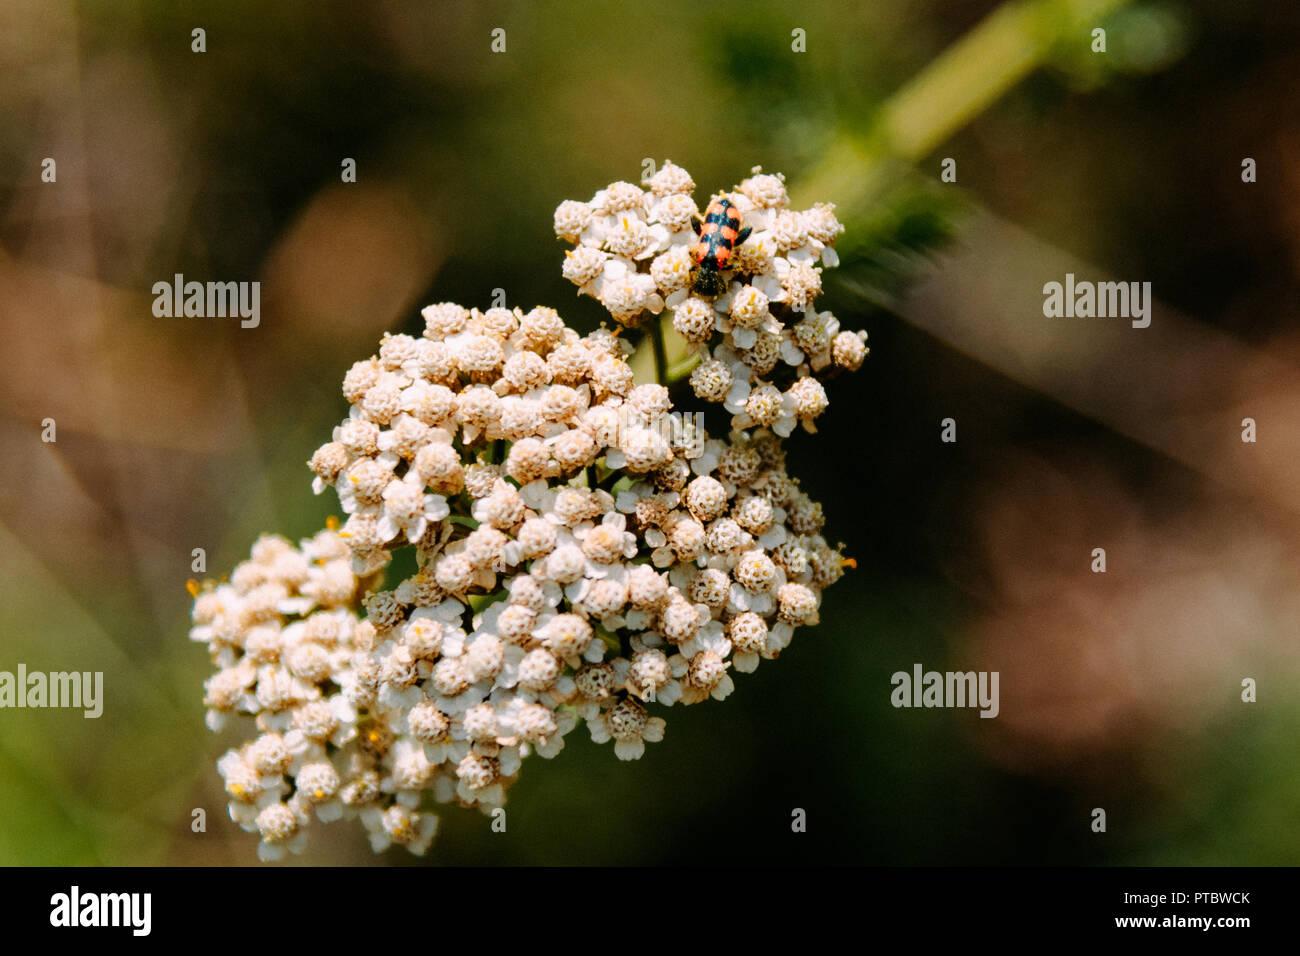 Macroo bee. Etna, Sicily 2018 - Stock Image